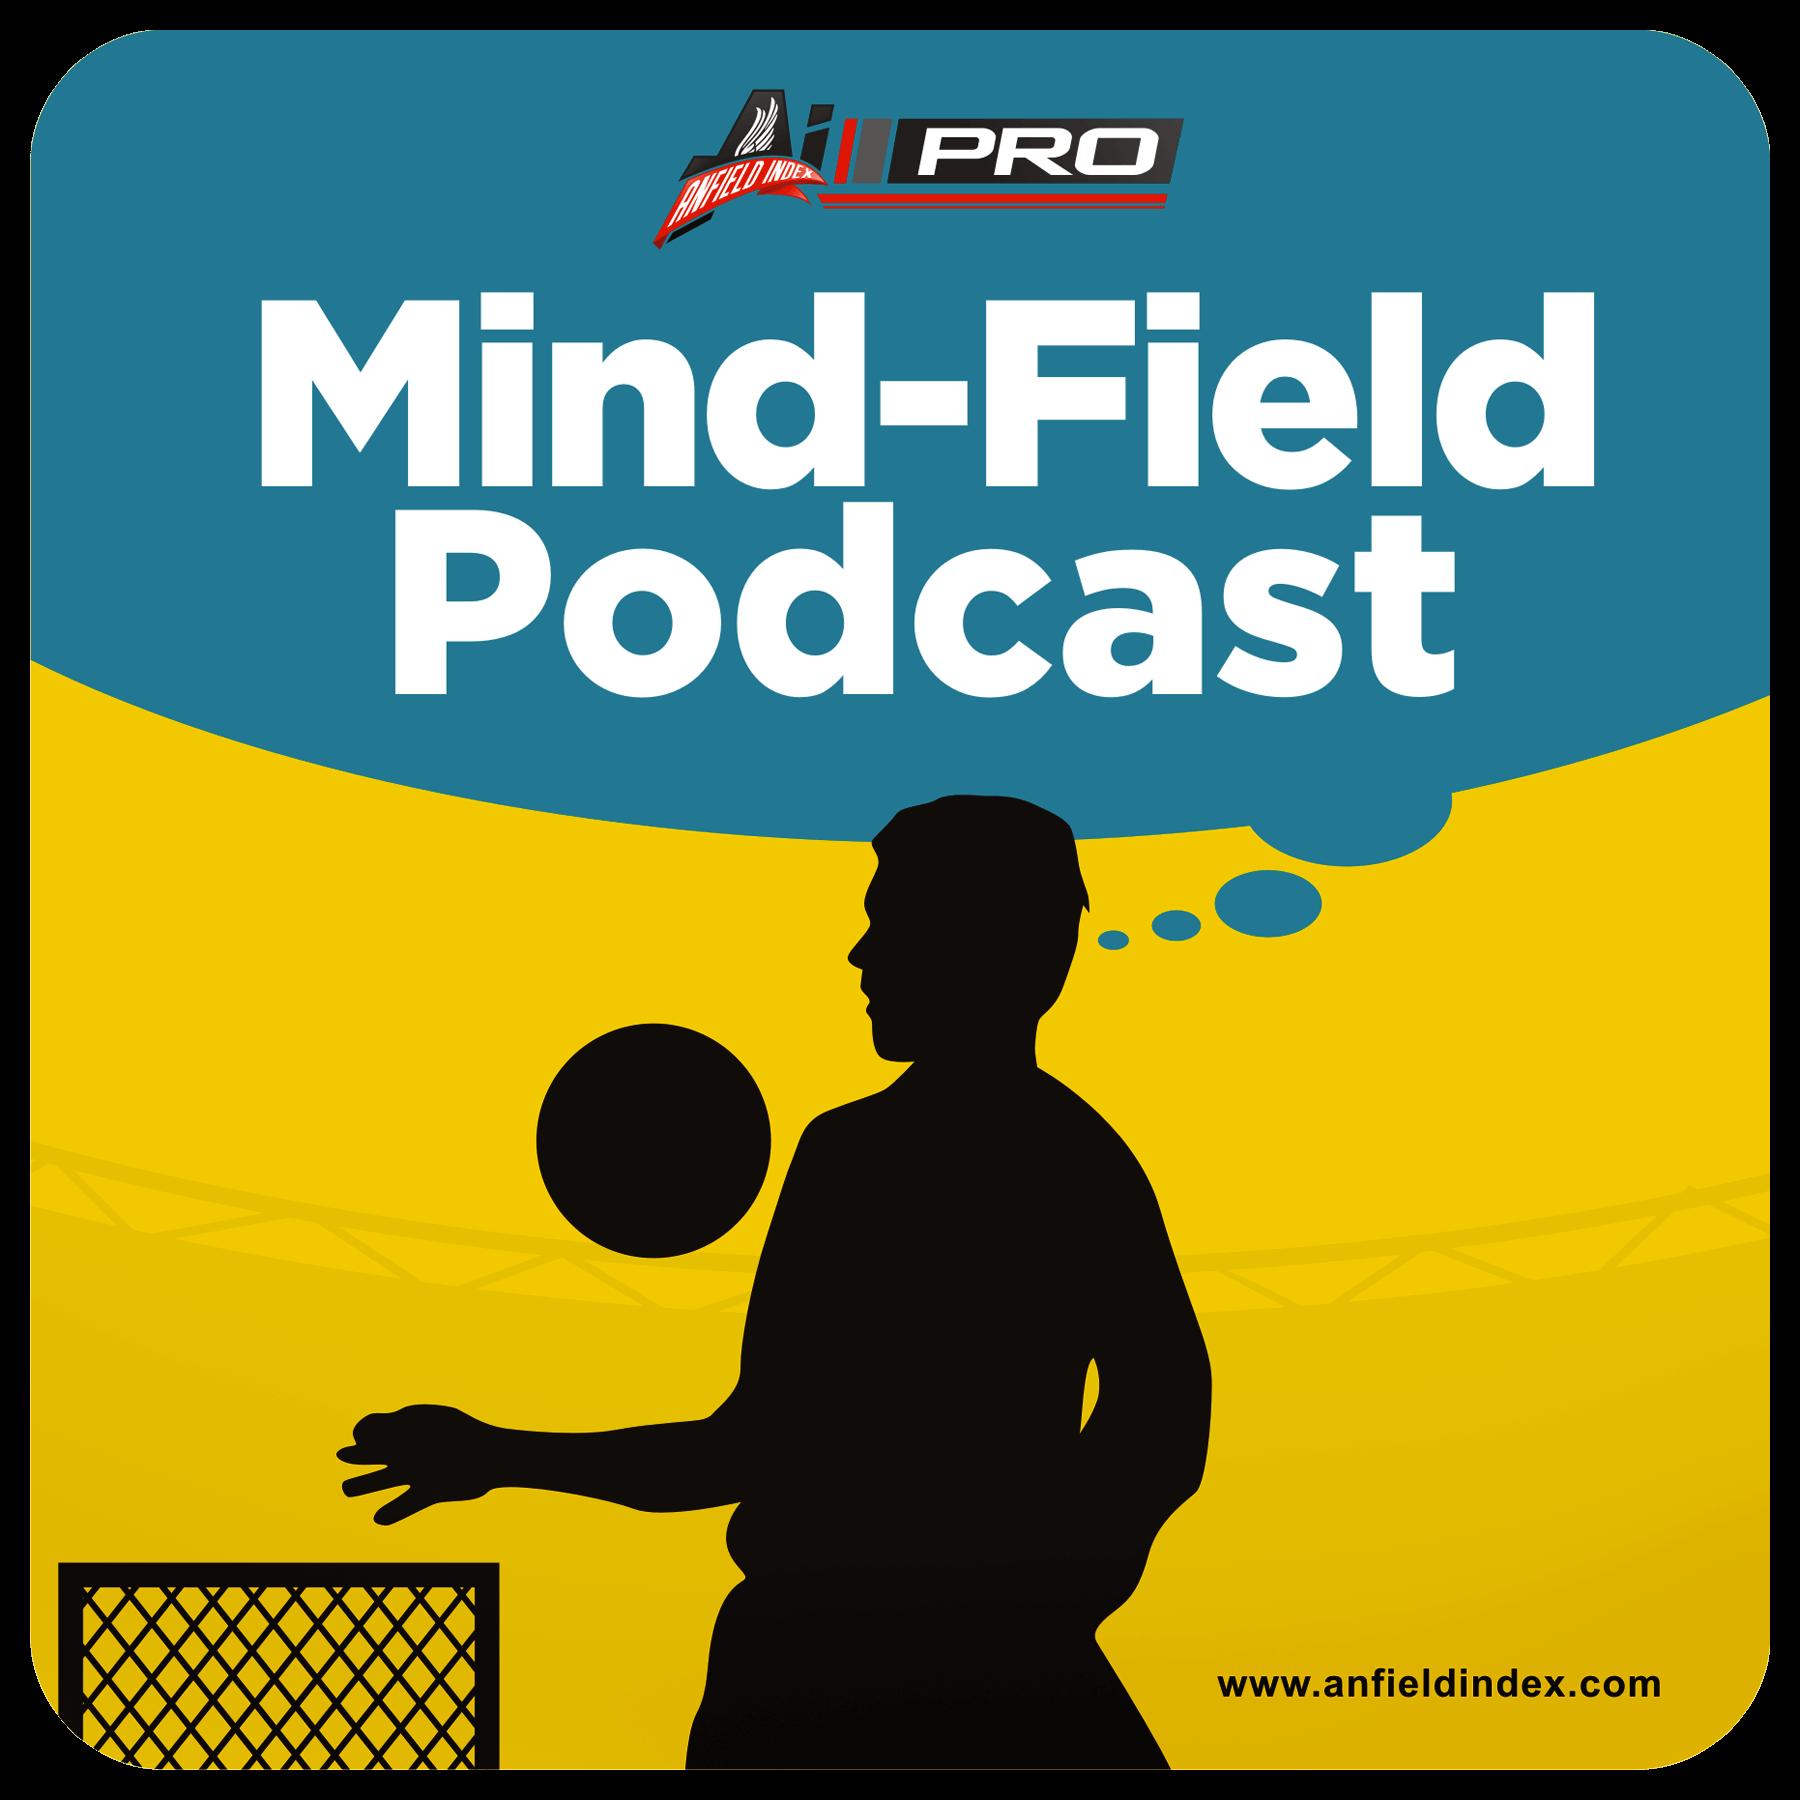 The Mind-Field Podcast: A Case Study